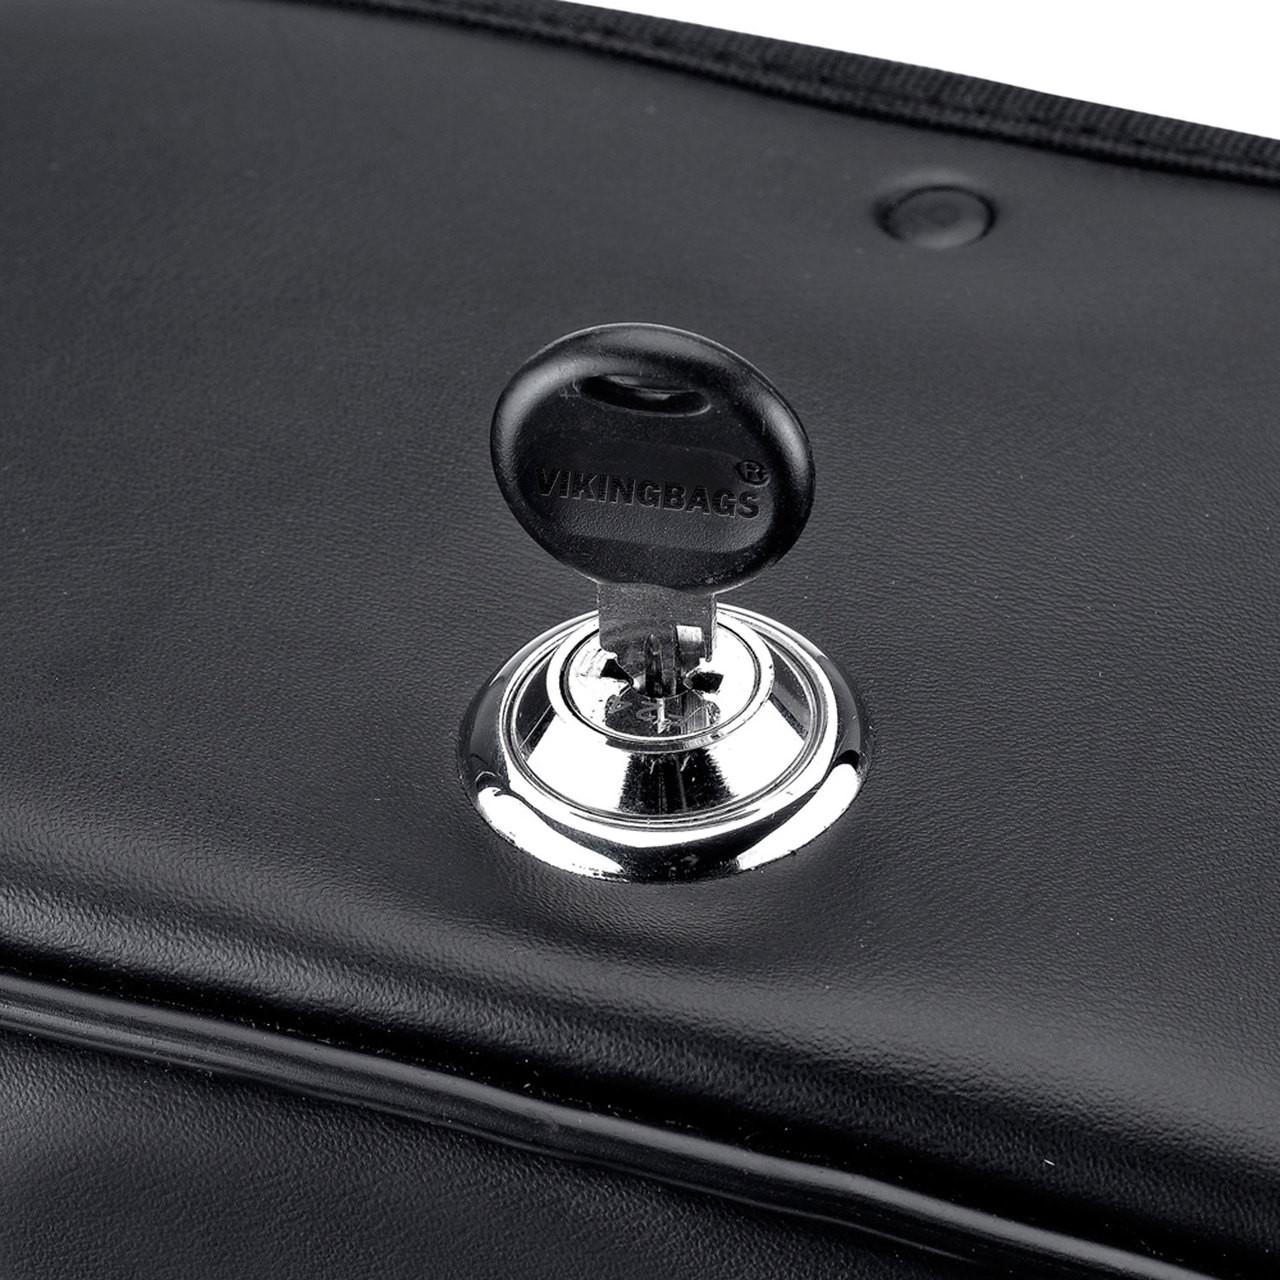 "Charger Slanted & Studed Saddlebags 15.5X10.5""X6"""" Key Lockable"